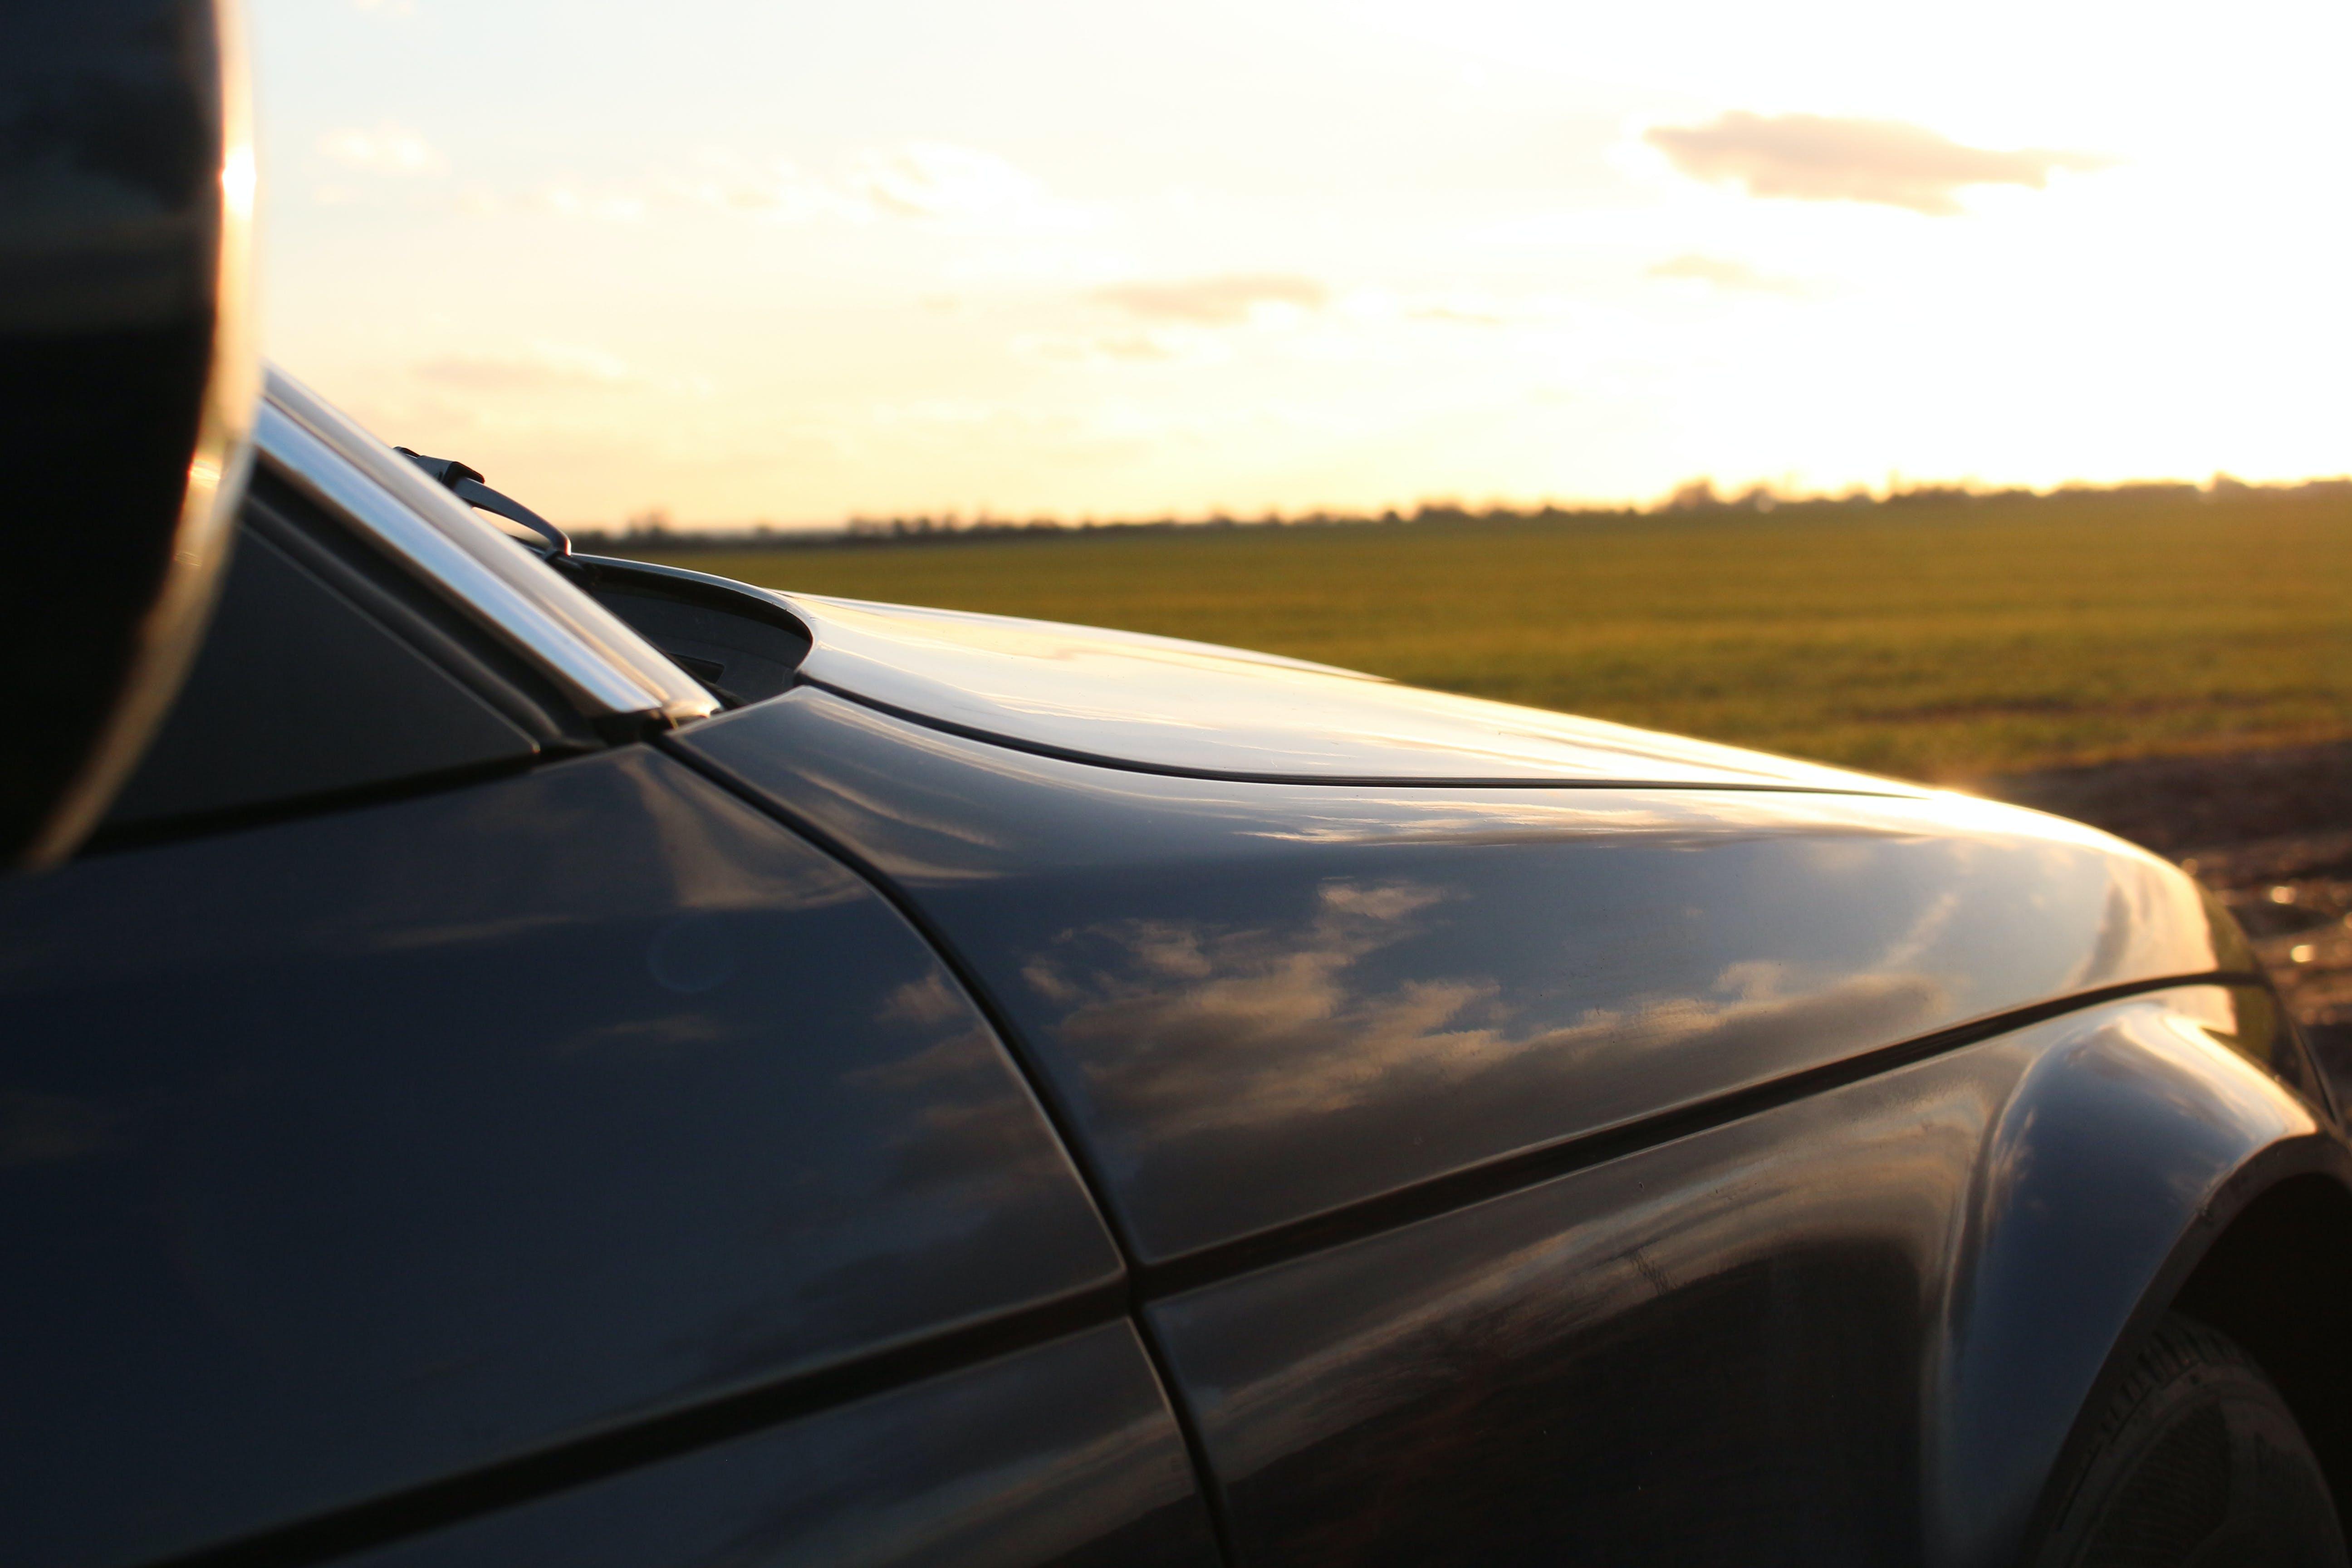 Free stock photo of #car #bmw #e46 #oldschool